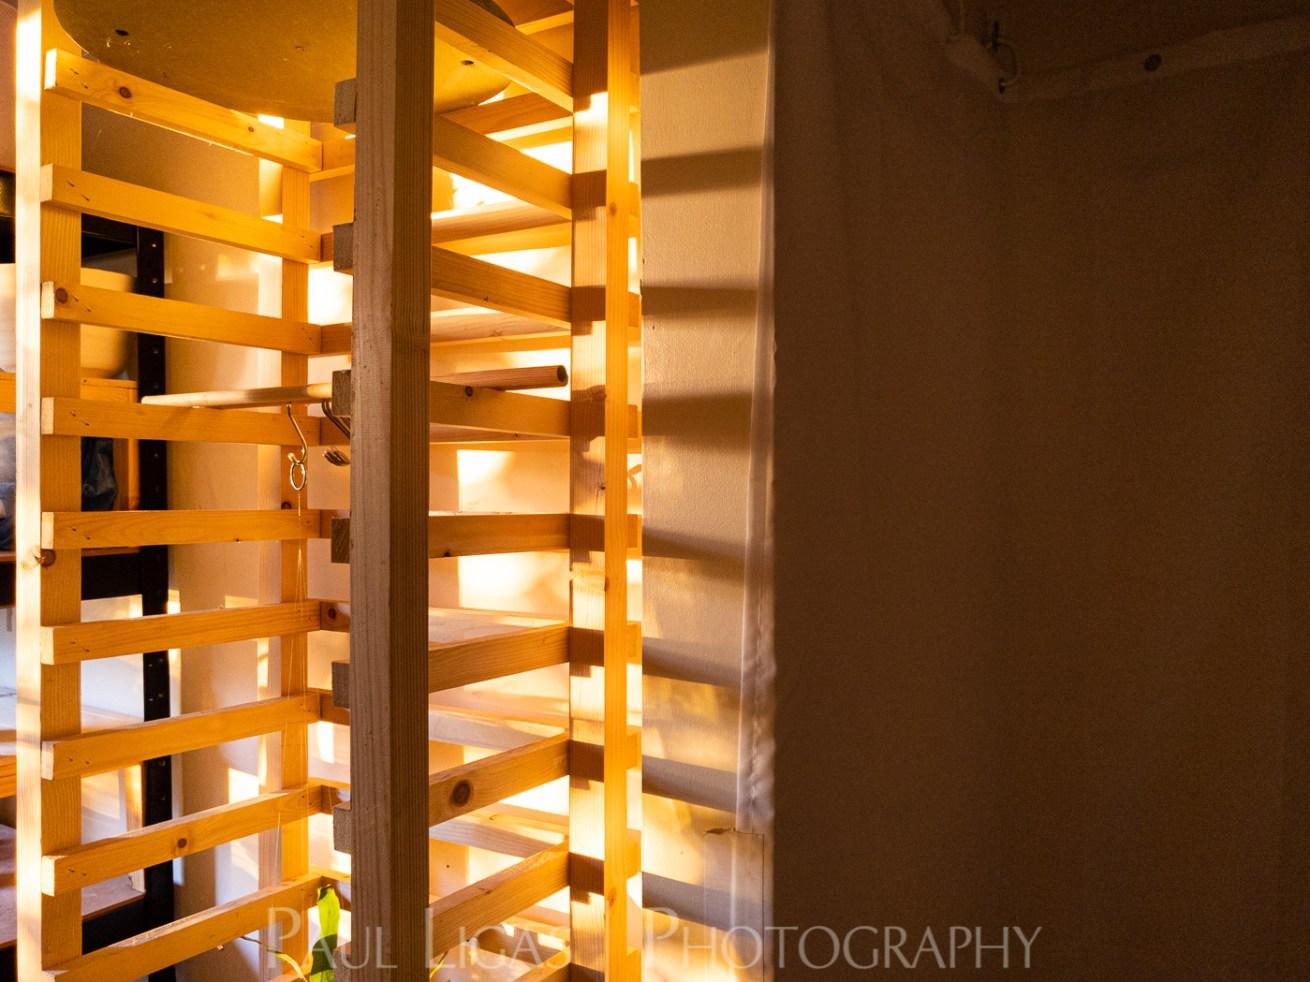 photos from inside a lockdown part 13 paul ligas photography hereford ledbury-210055